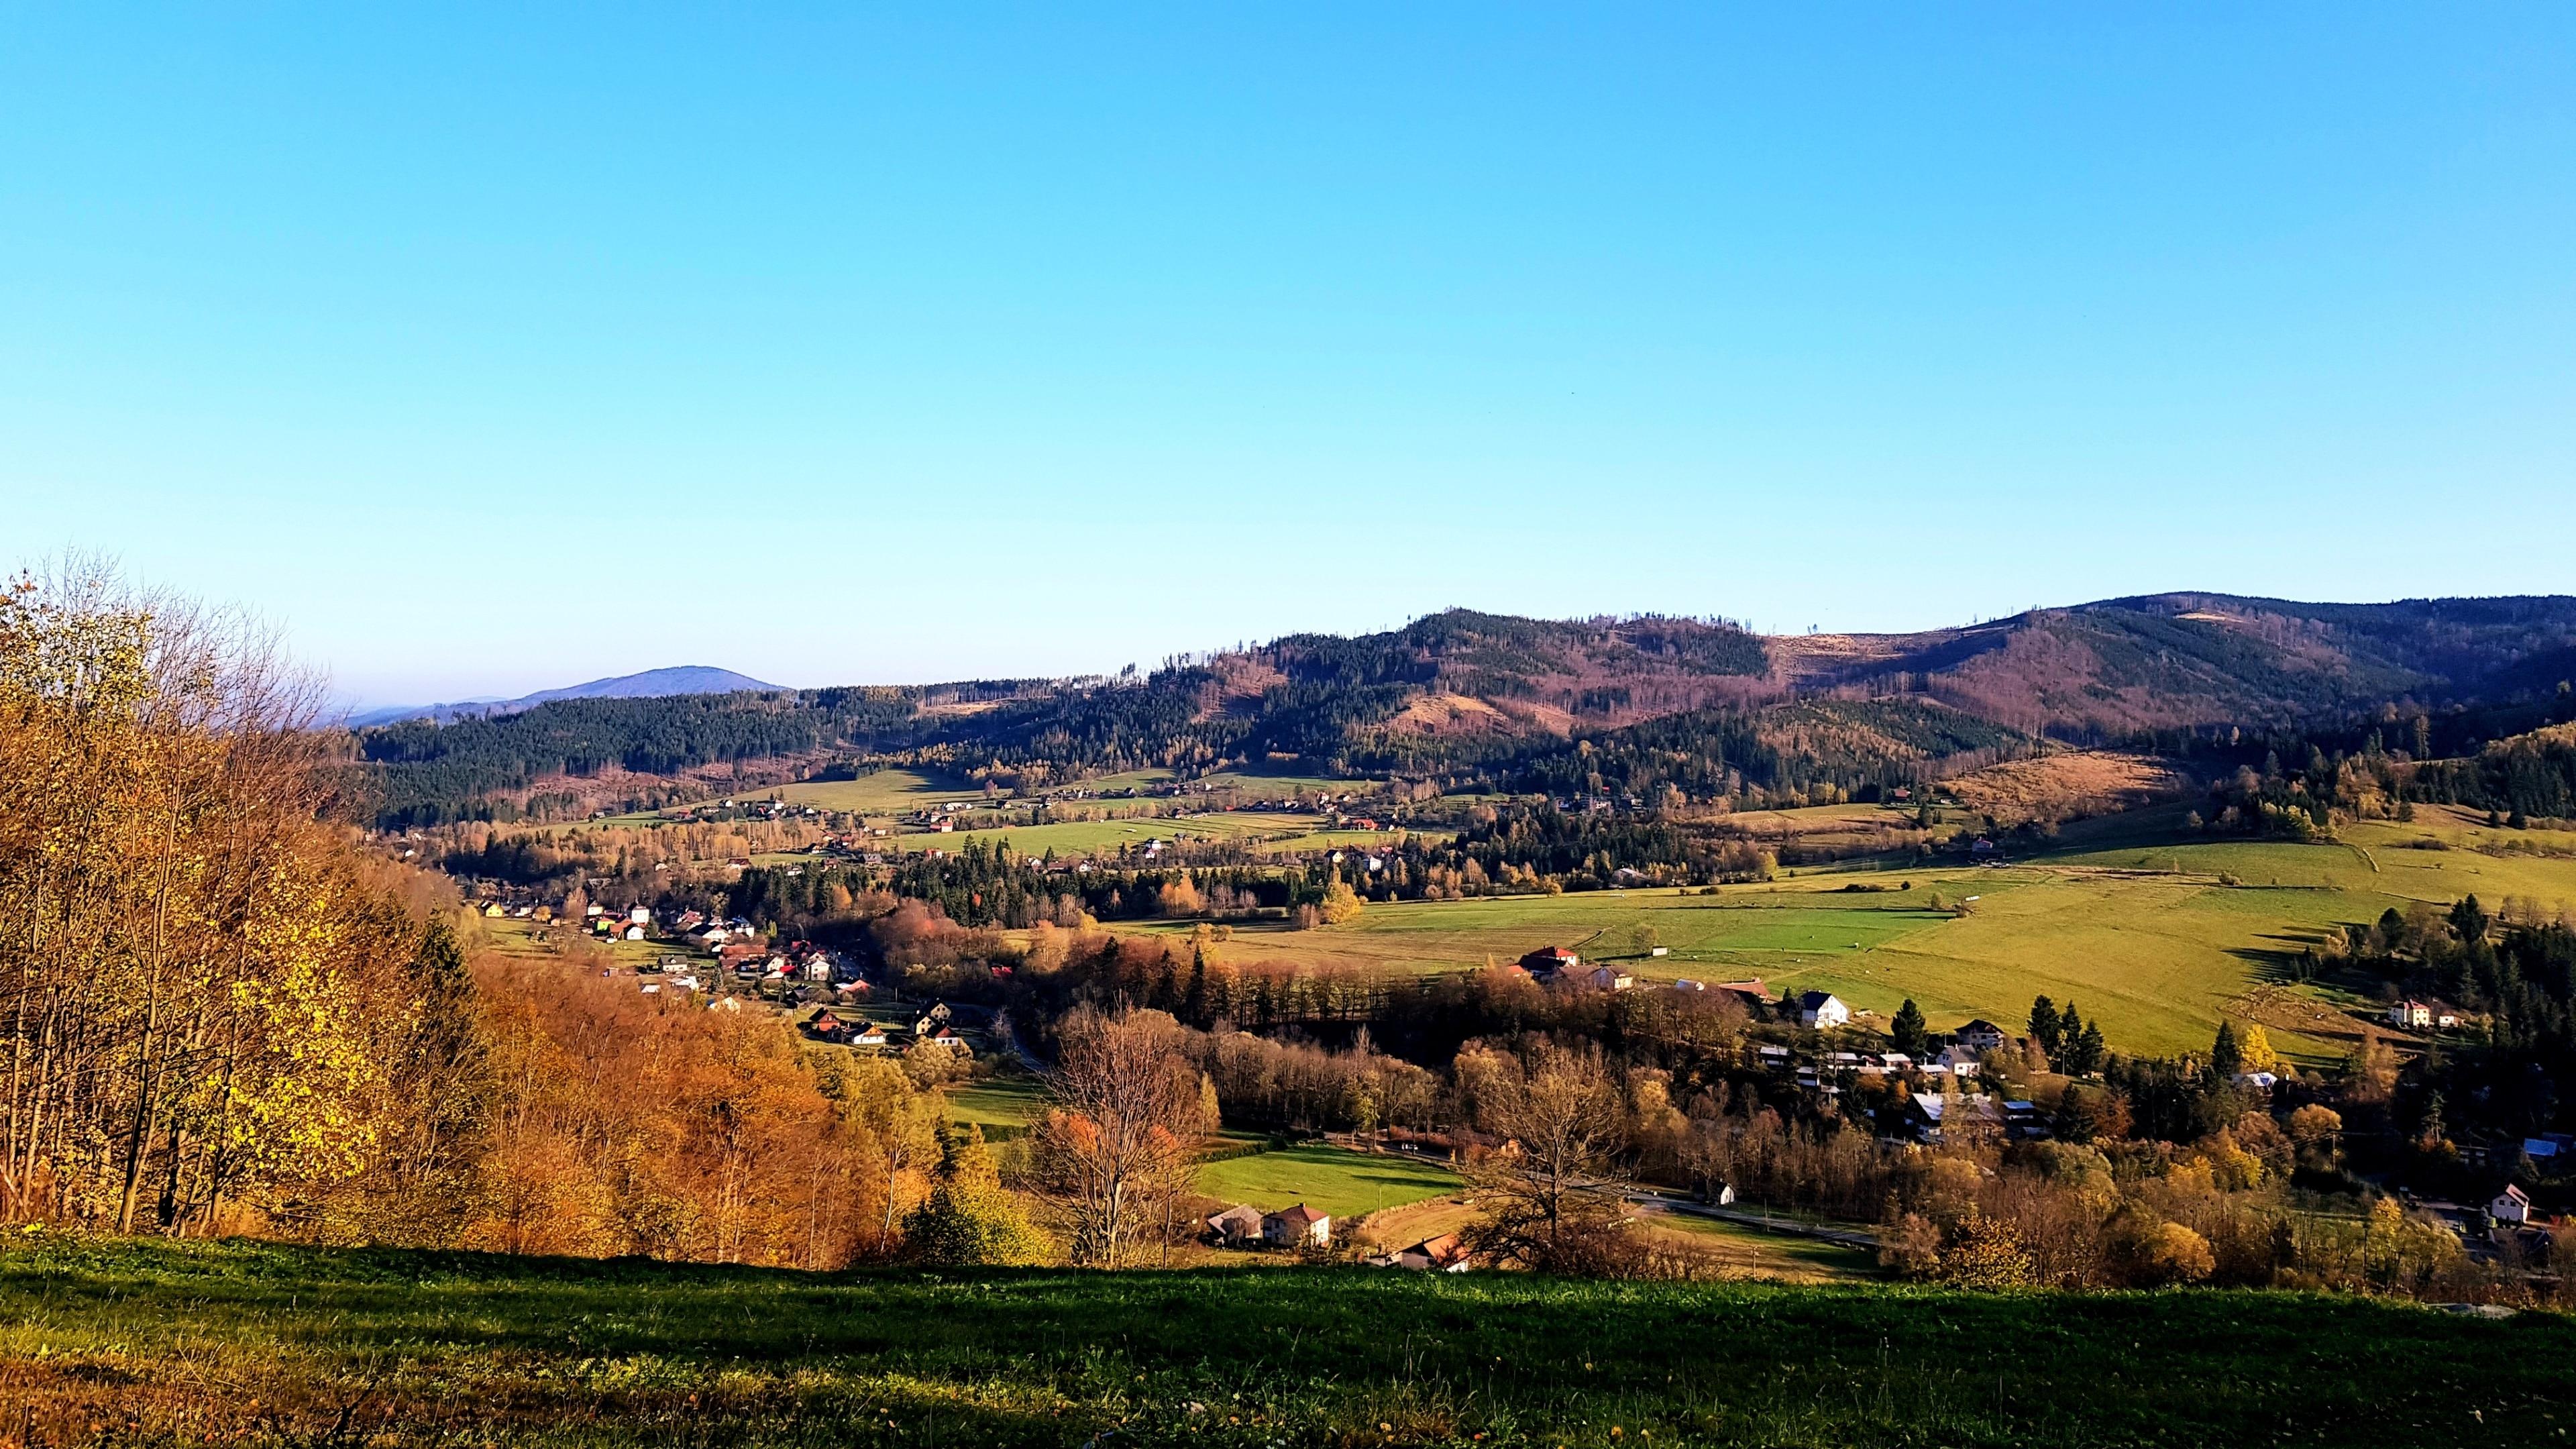 Moravia-Silesia (område), Tjekkiet